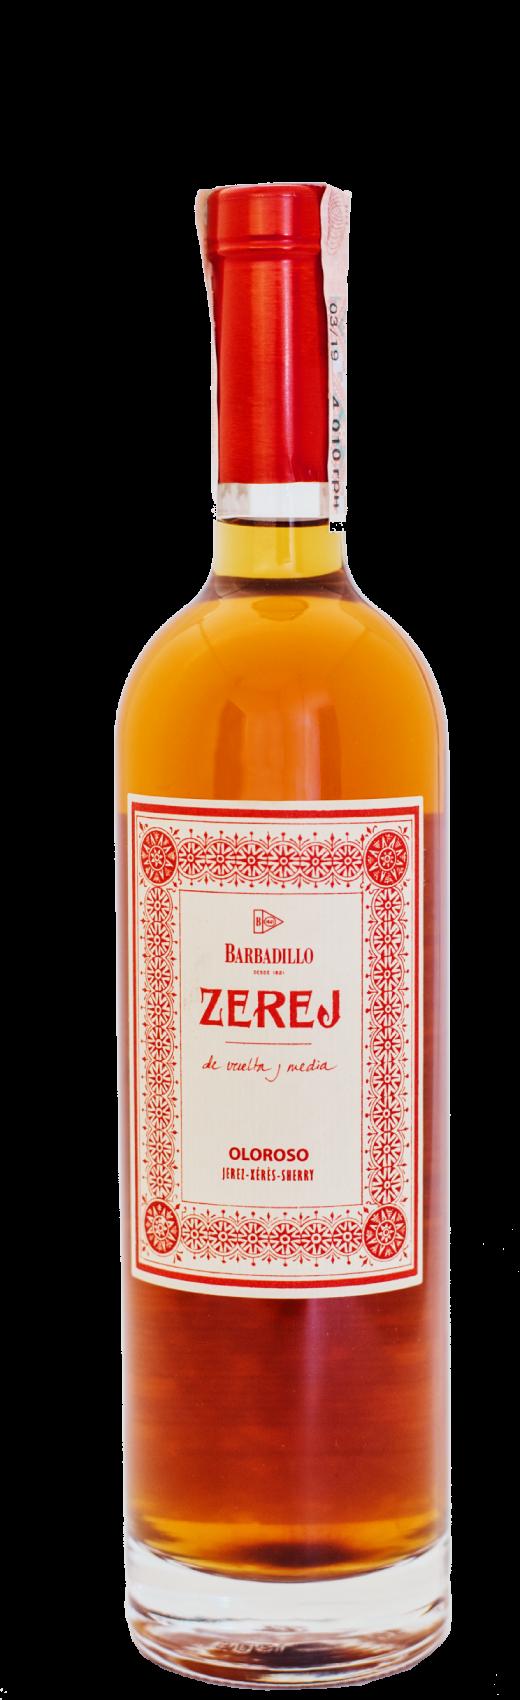 Zerej de Barbadillo Oloroso Jerez wine wine магазин склад